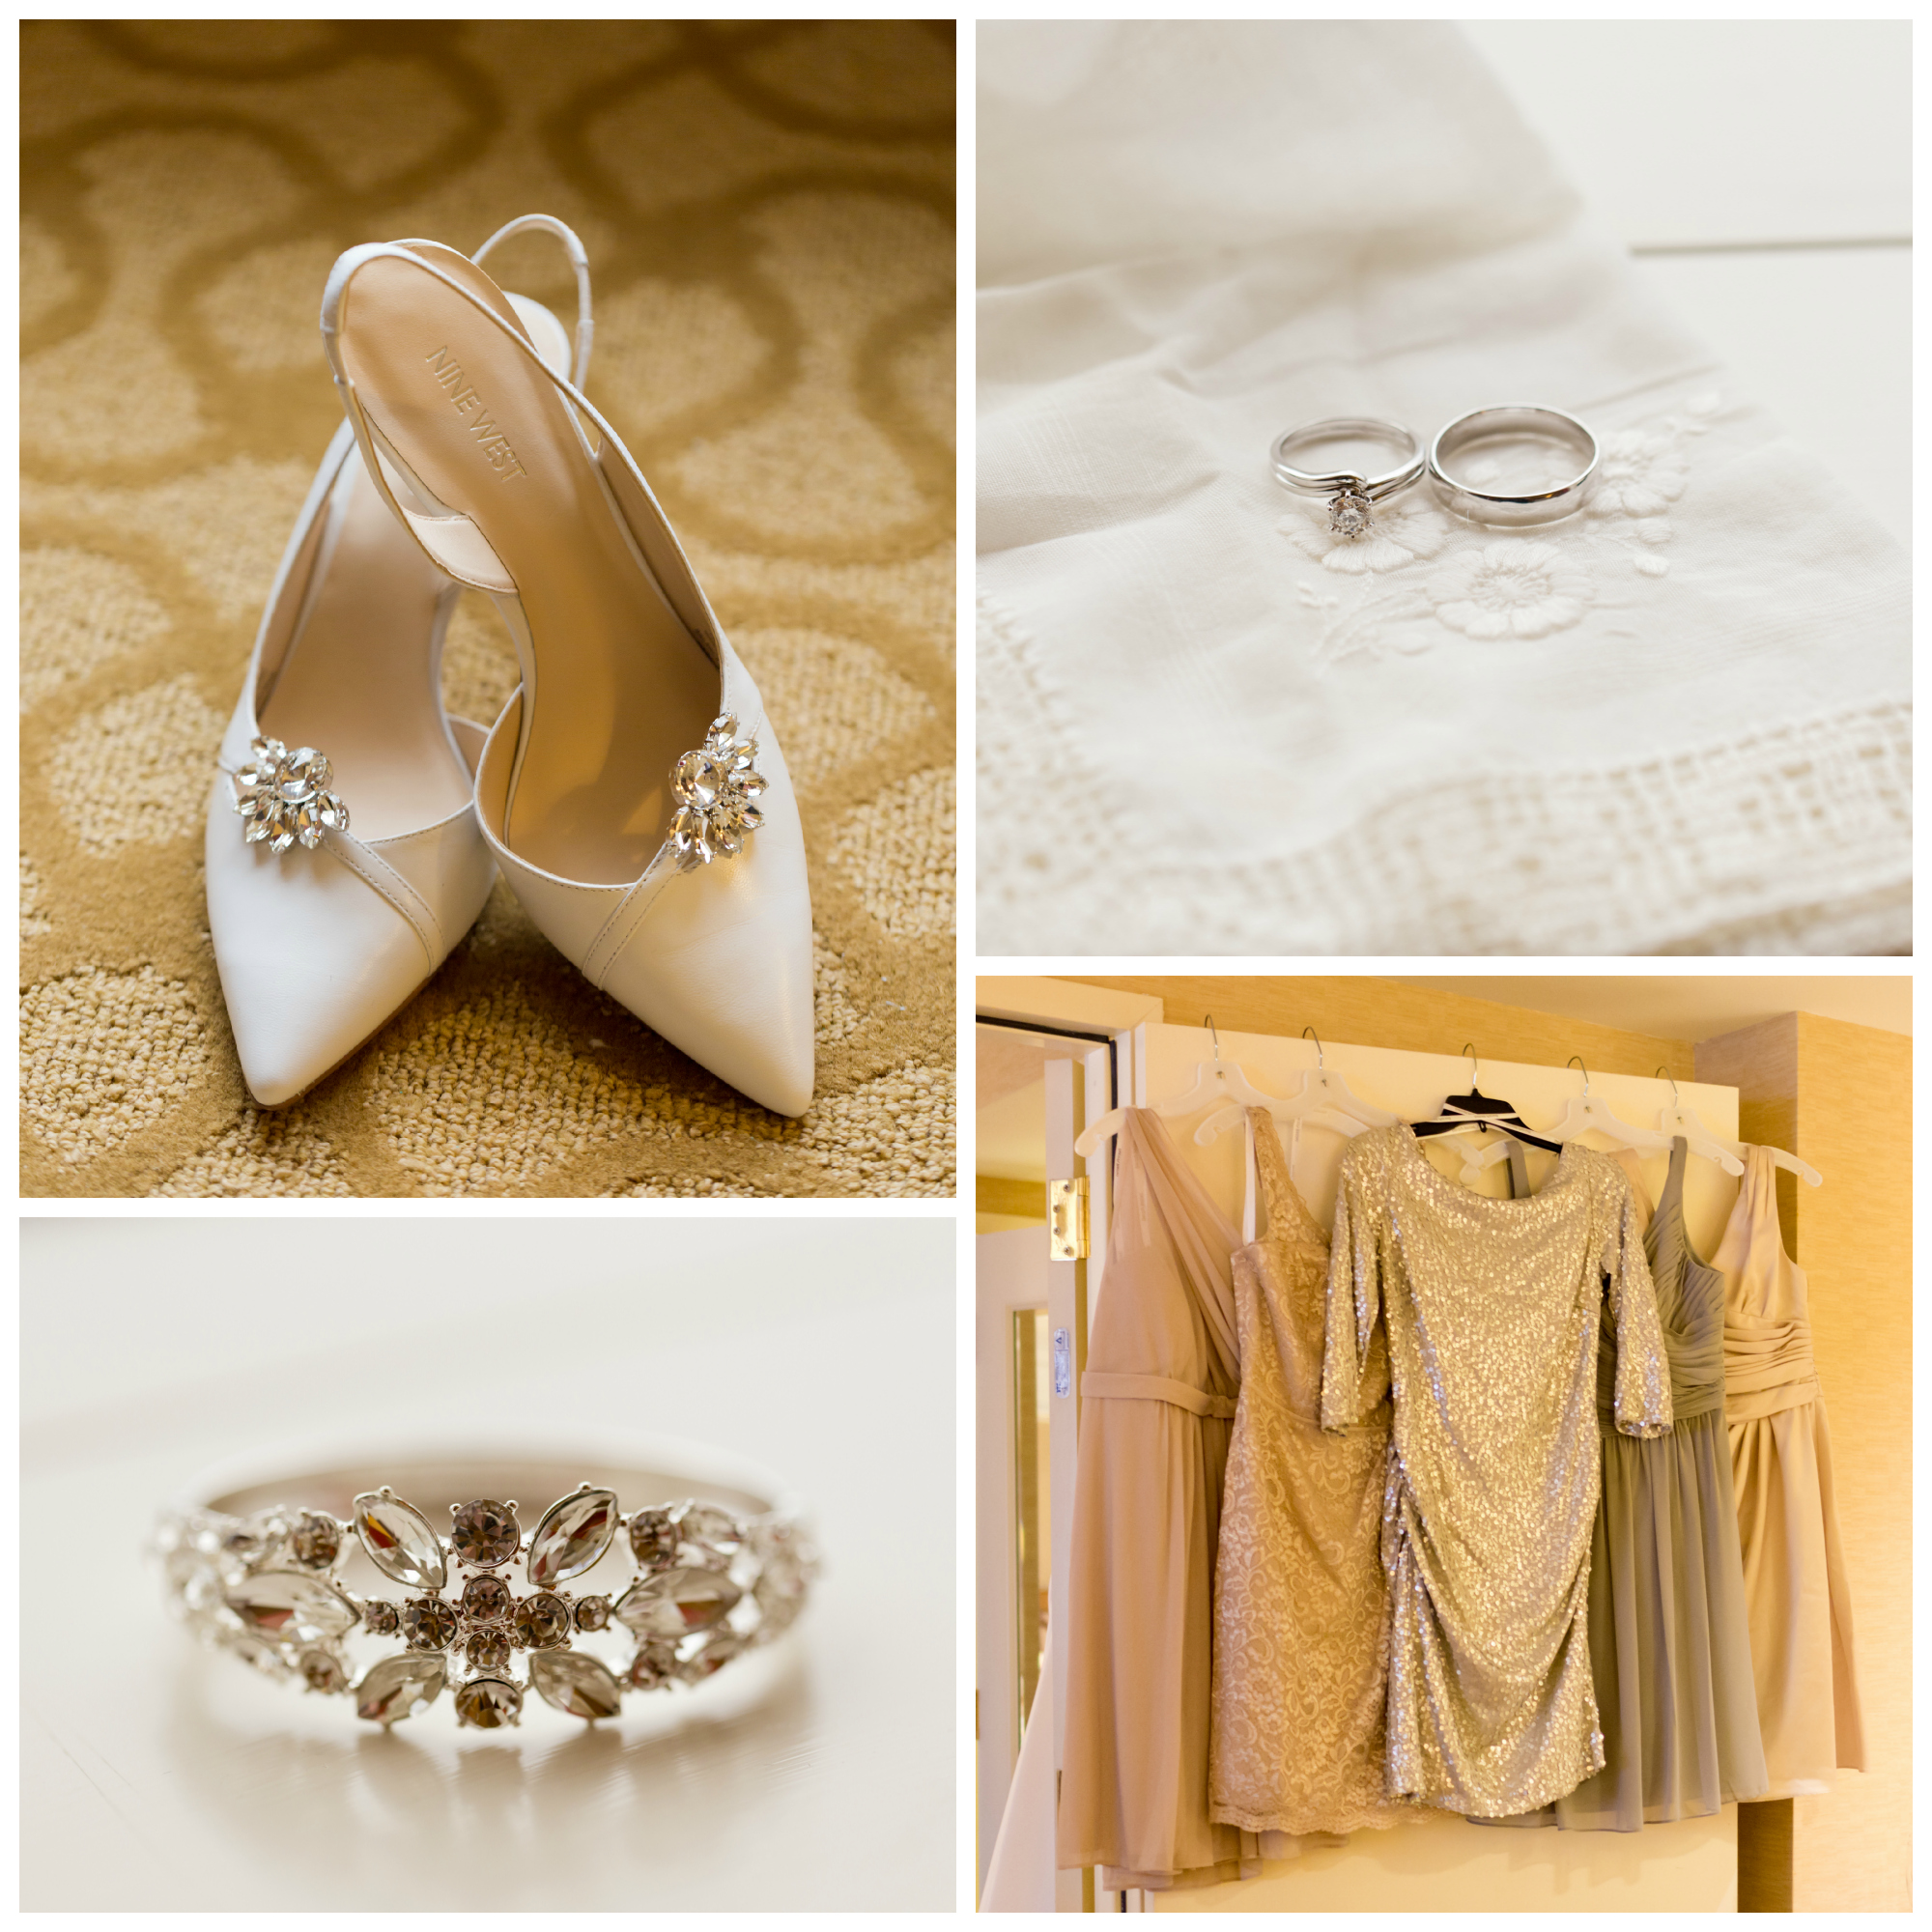 Cream, Gray, Champagne wedding details (shoes, rings, bracelet, bridesmaid dresses)